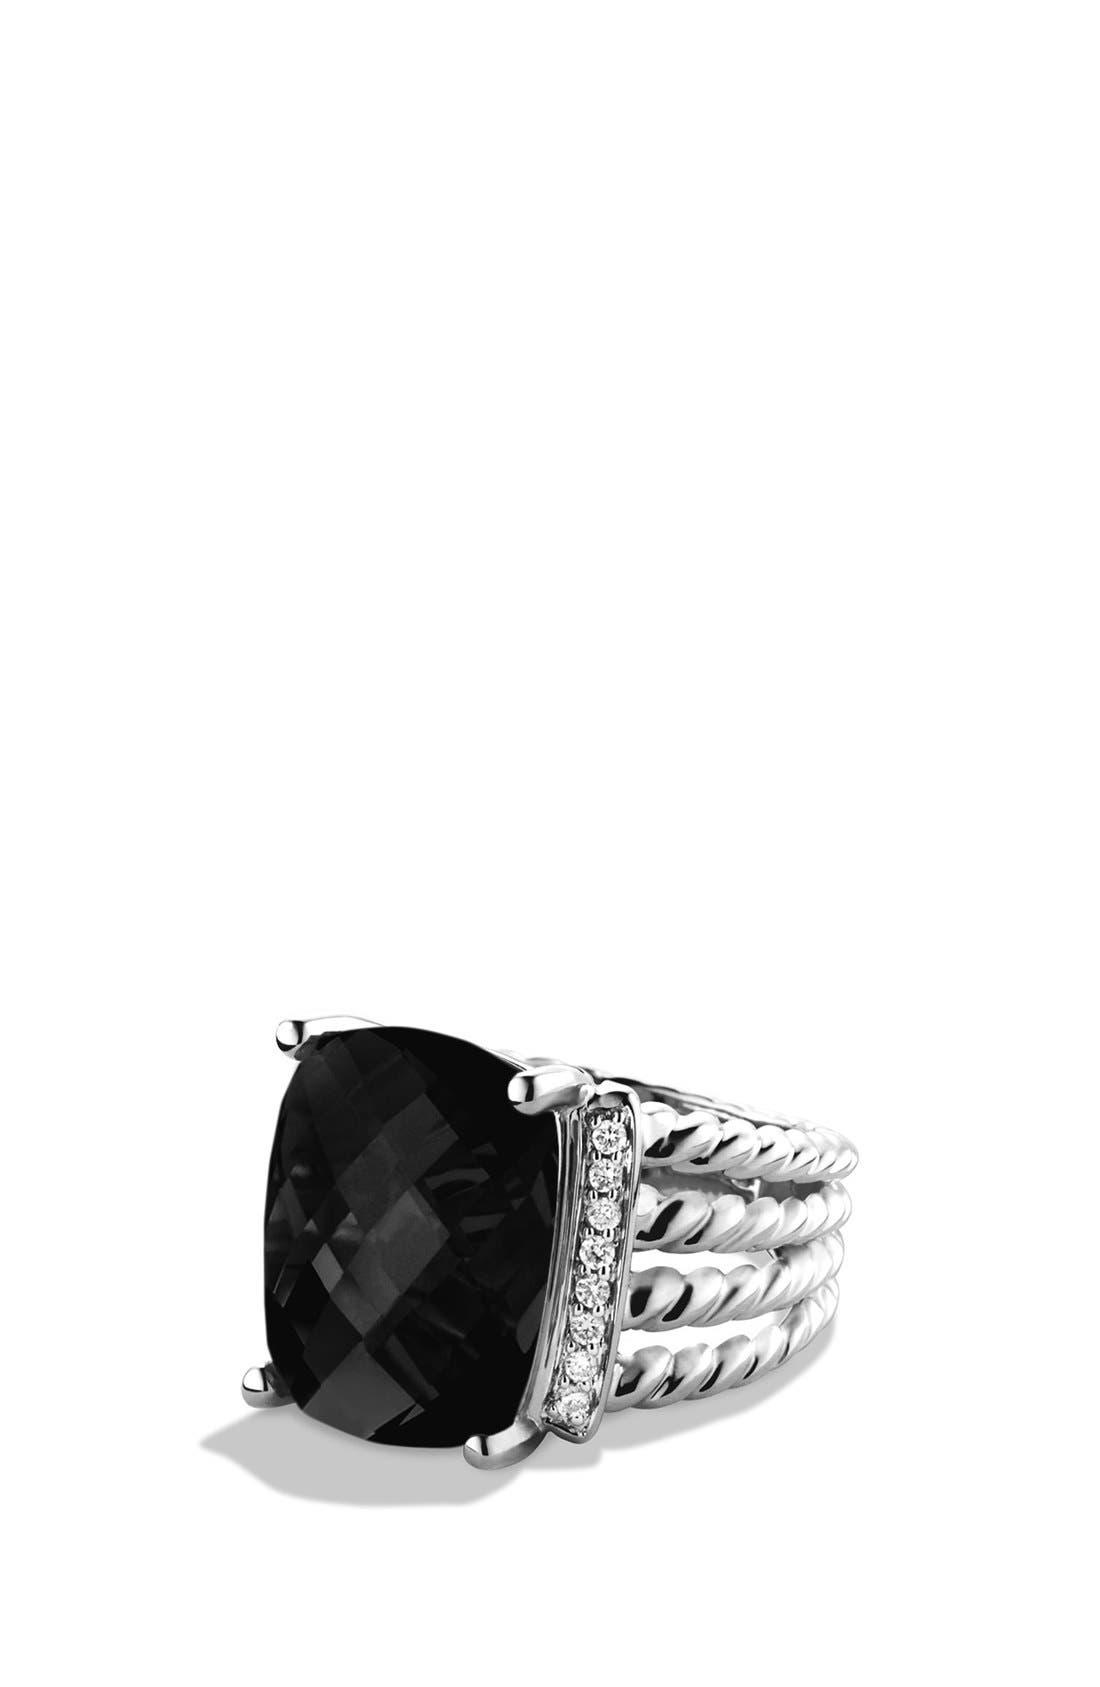 Alternate Image 1 Selected - David Yurman 'Wheaton' Ring with Semiprecious Stone & Diamonds